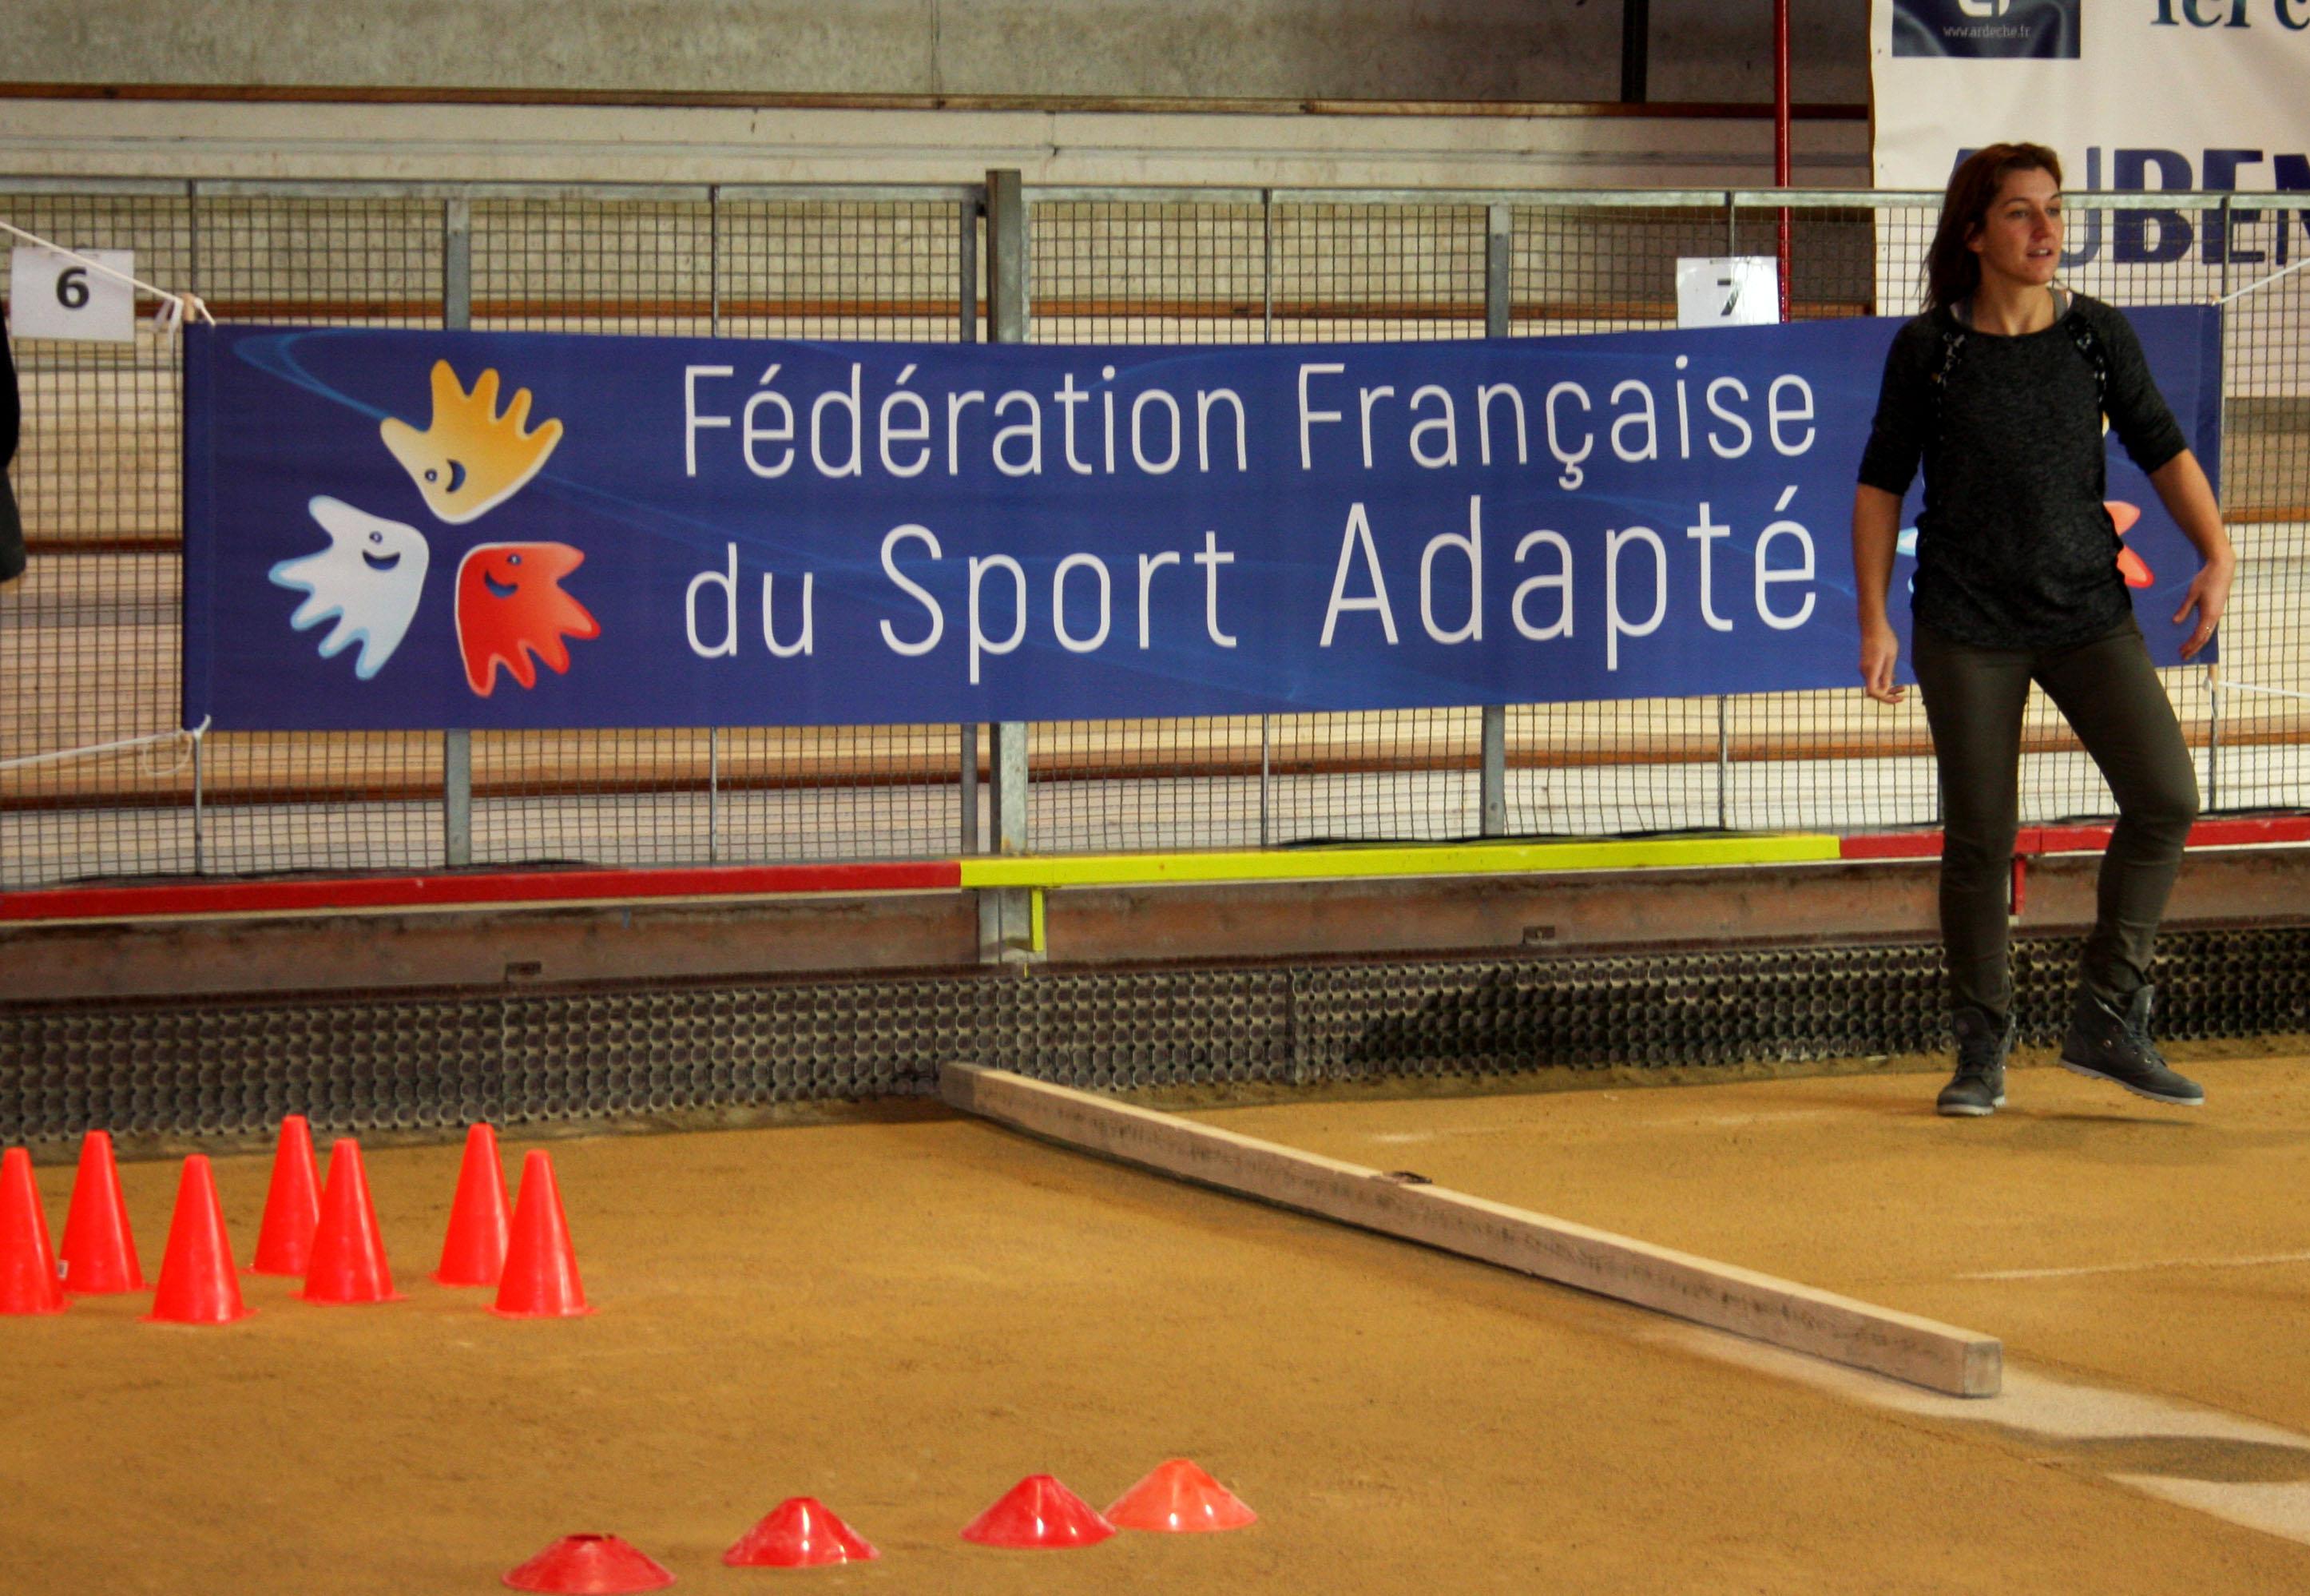 Belle journée de Sport adapté au boulodrome Jean Aubert